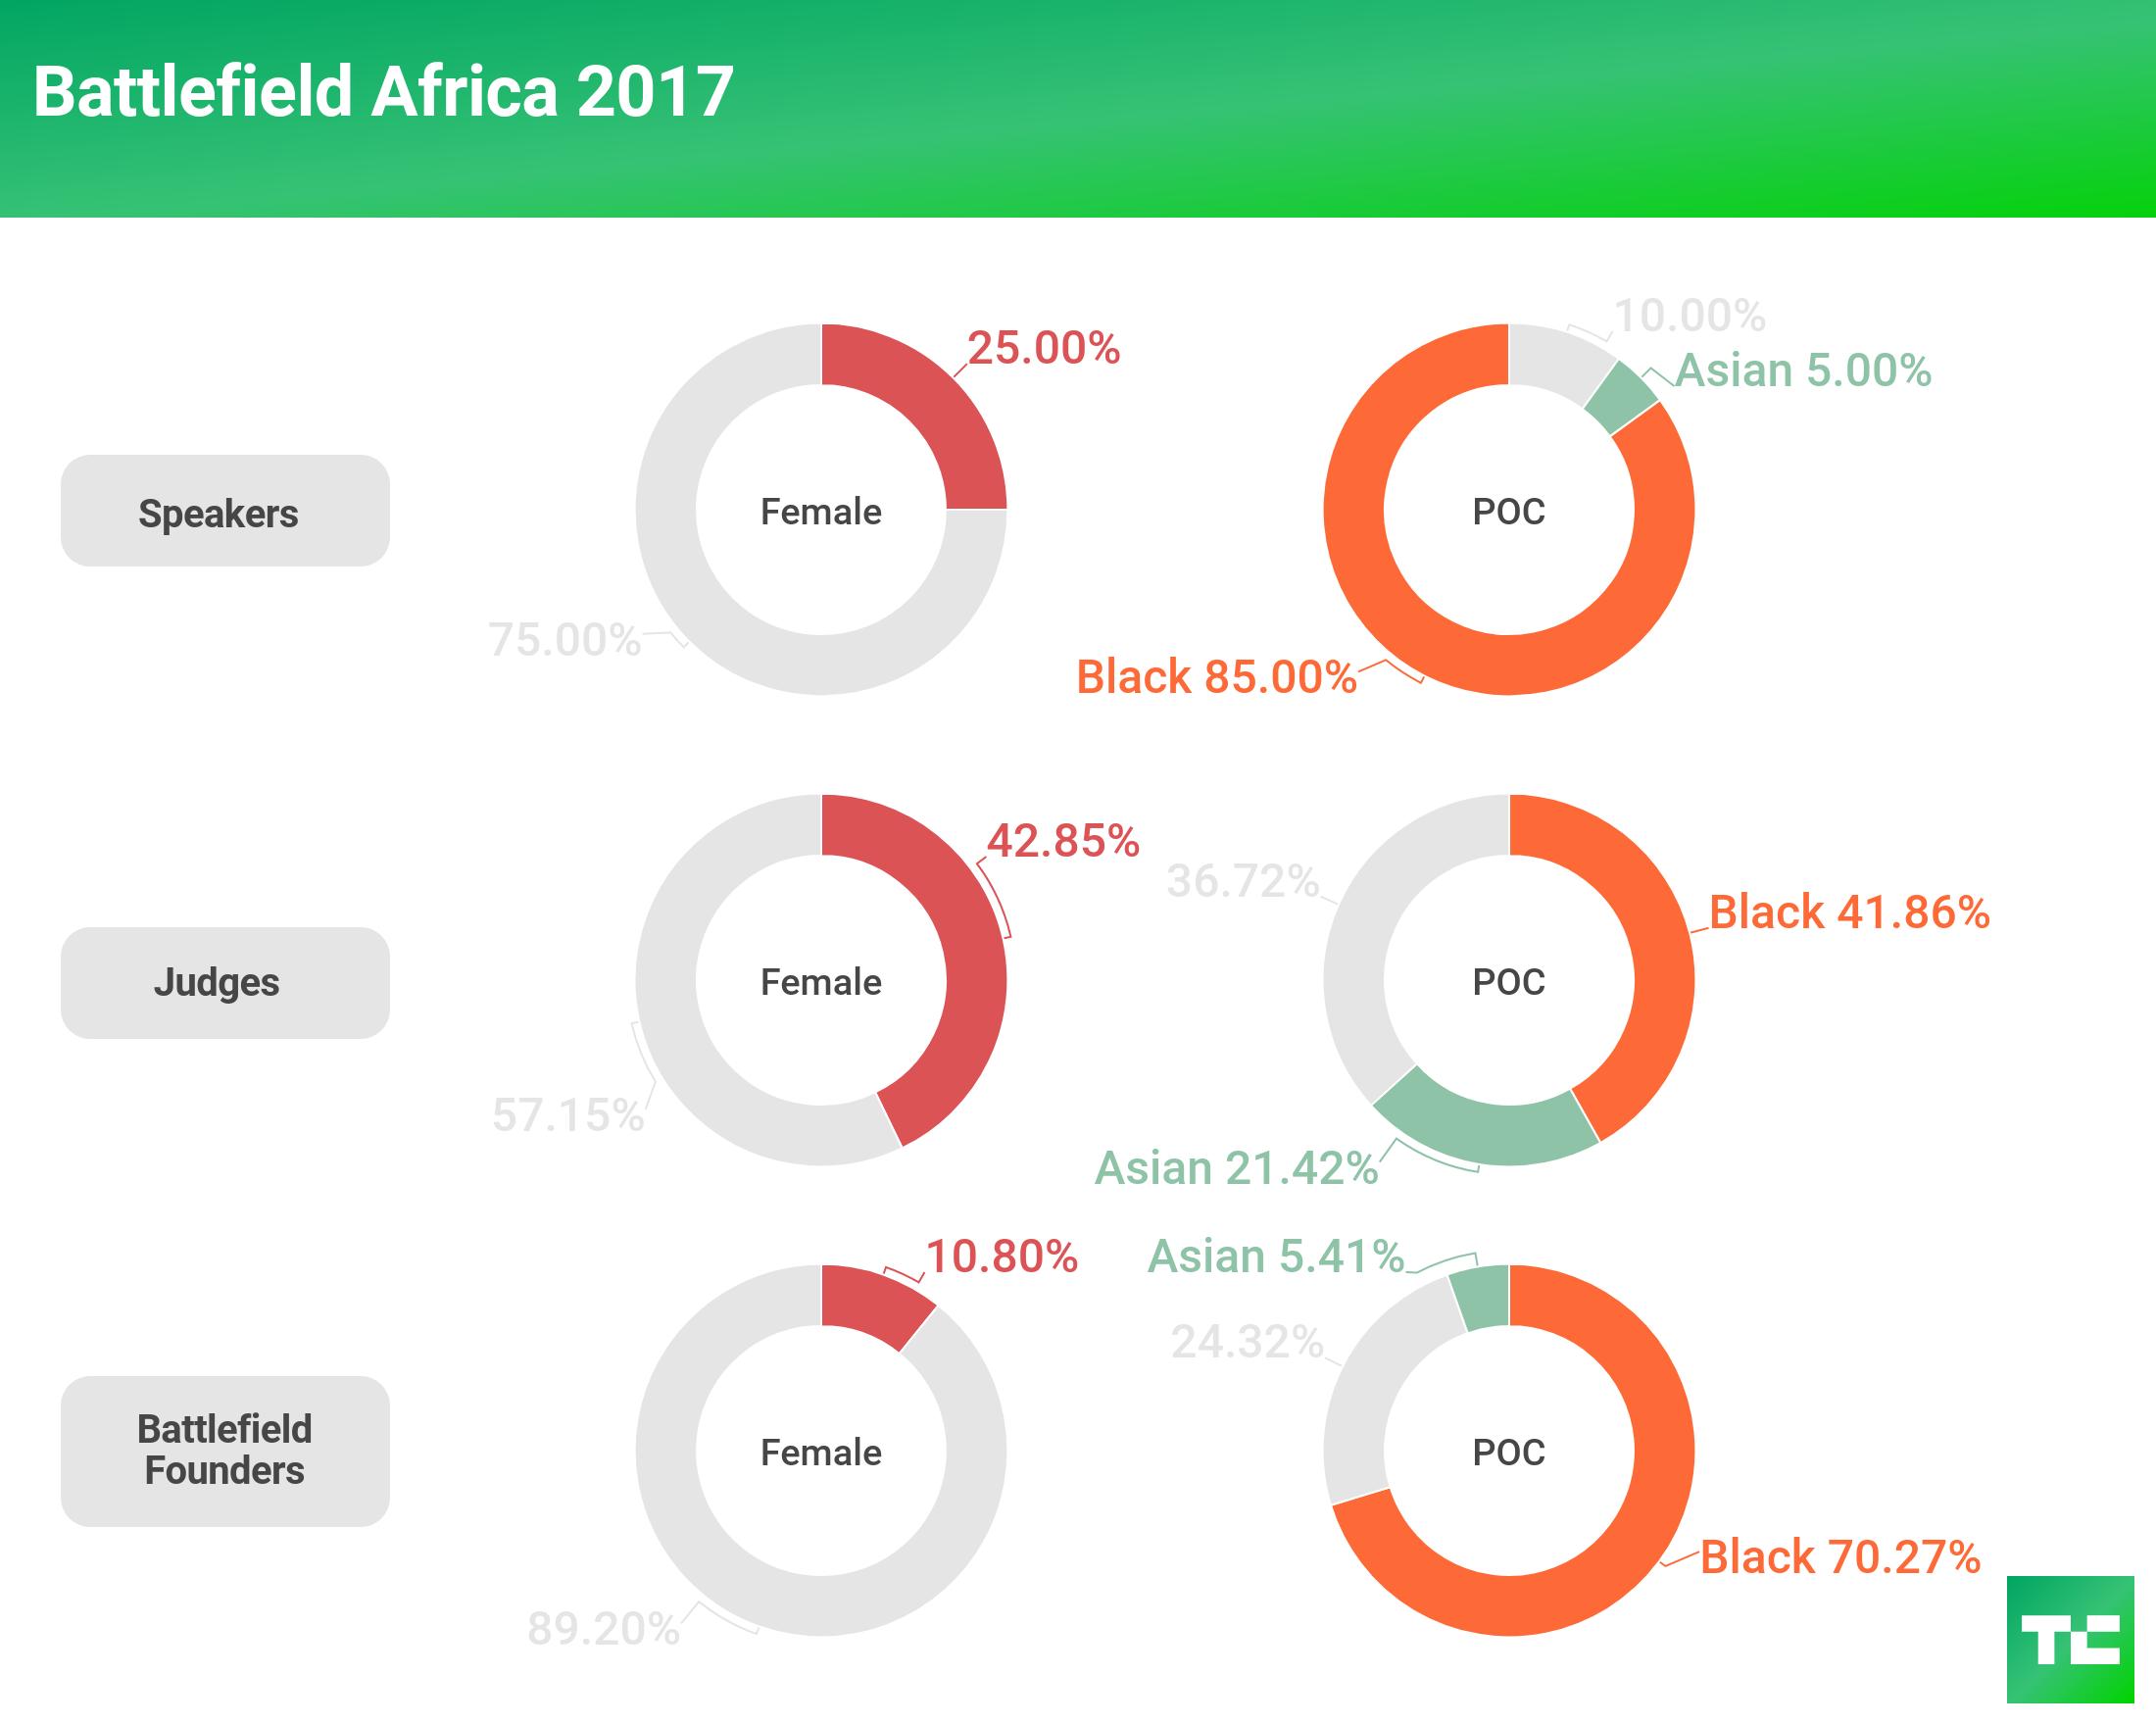 tc diversity 2018 battlefield africa 2017